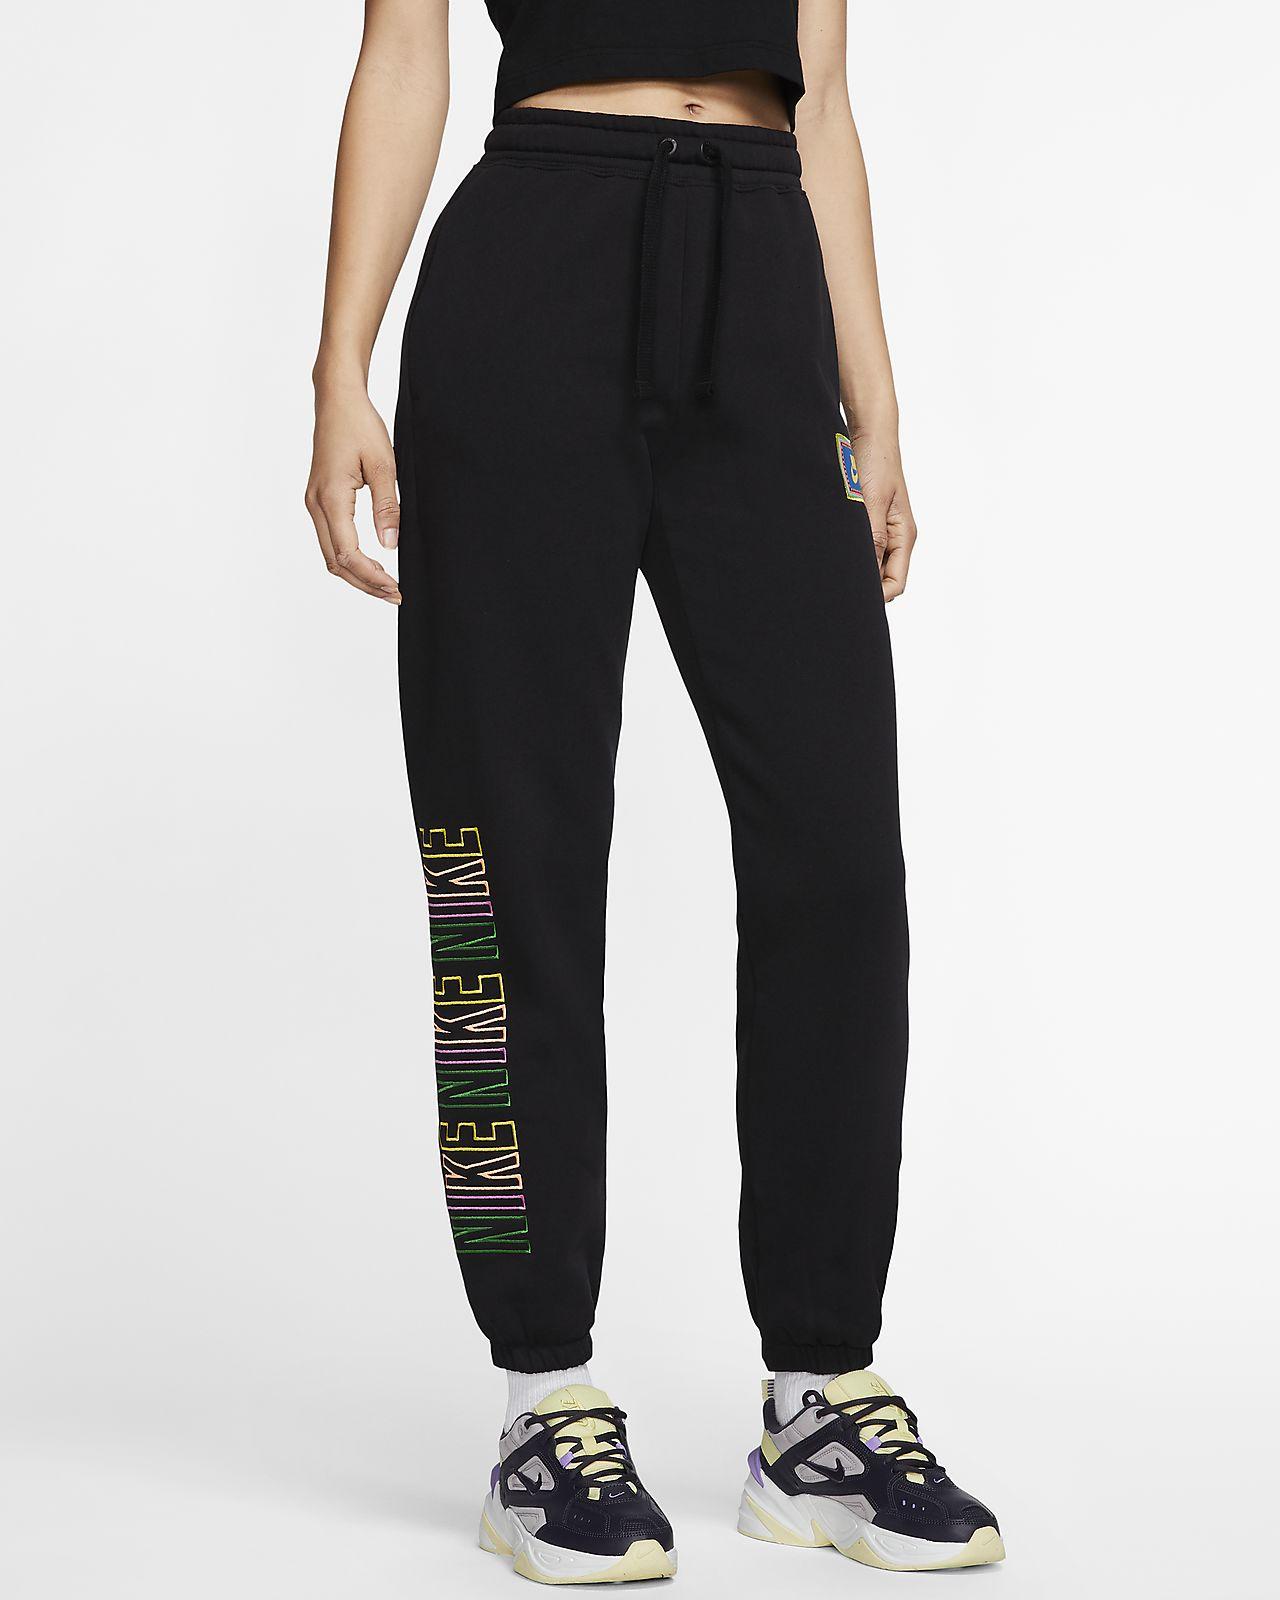 Pantalones de tejido Fleece para mujer Nike Sportswear